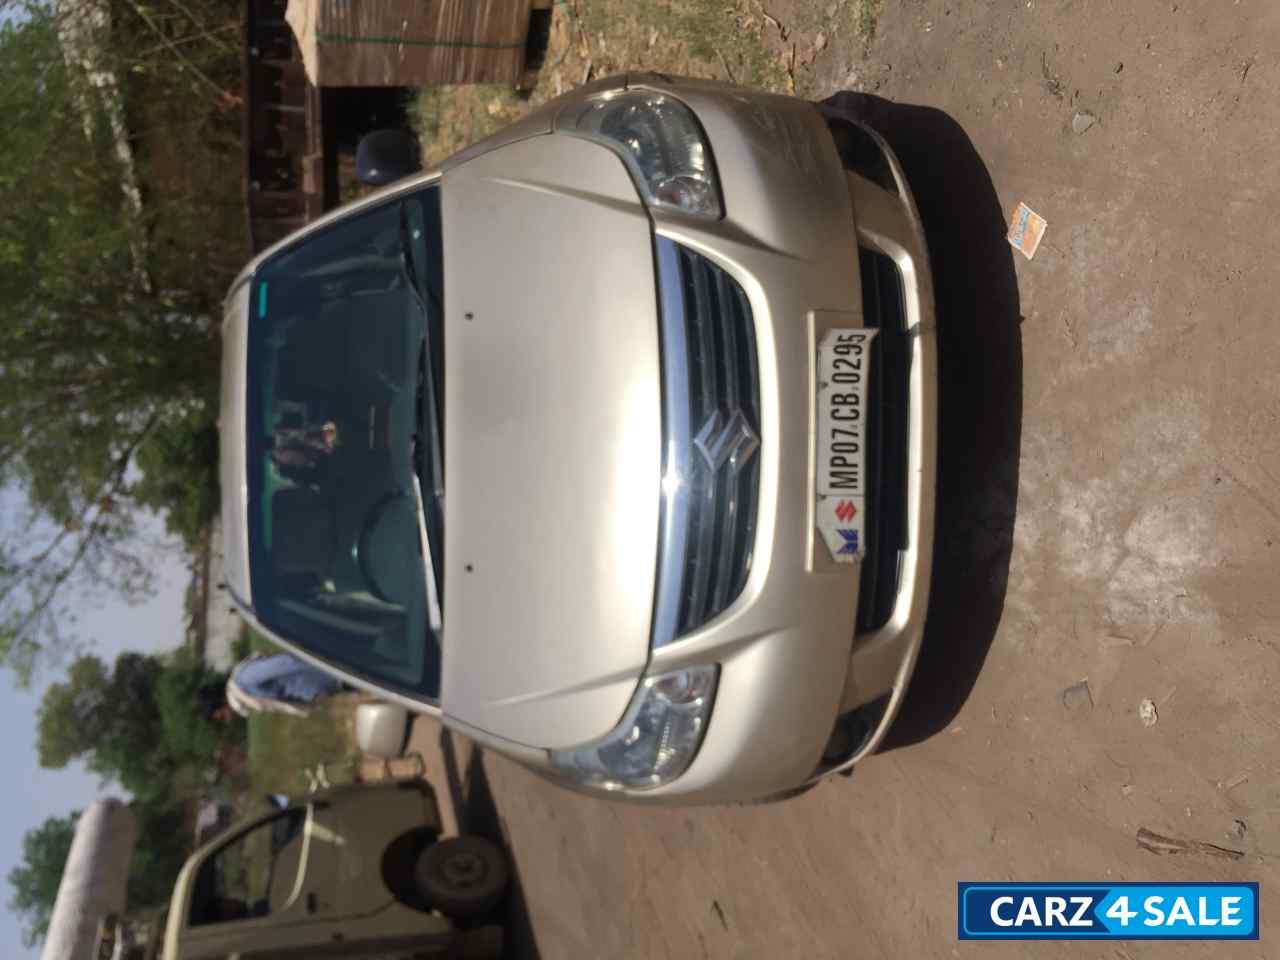 Used 2007 Model Maruti Suzuki Sx4 For Sale In Gwalior Id